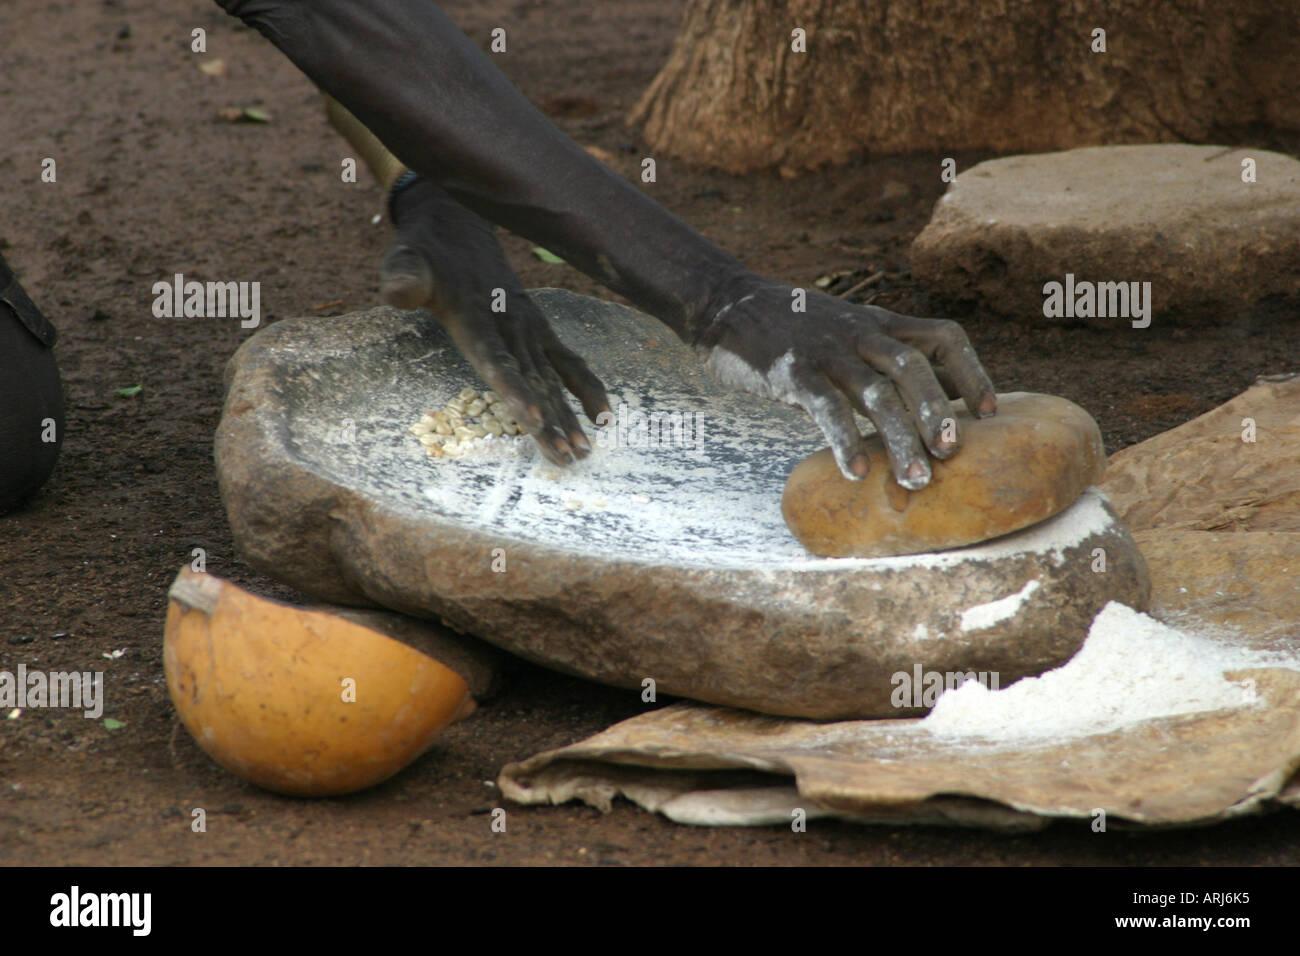 Toposa woman grinding sorghum on grindstone, Sudan - Stock Image